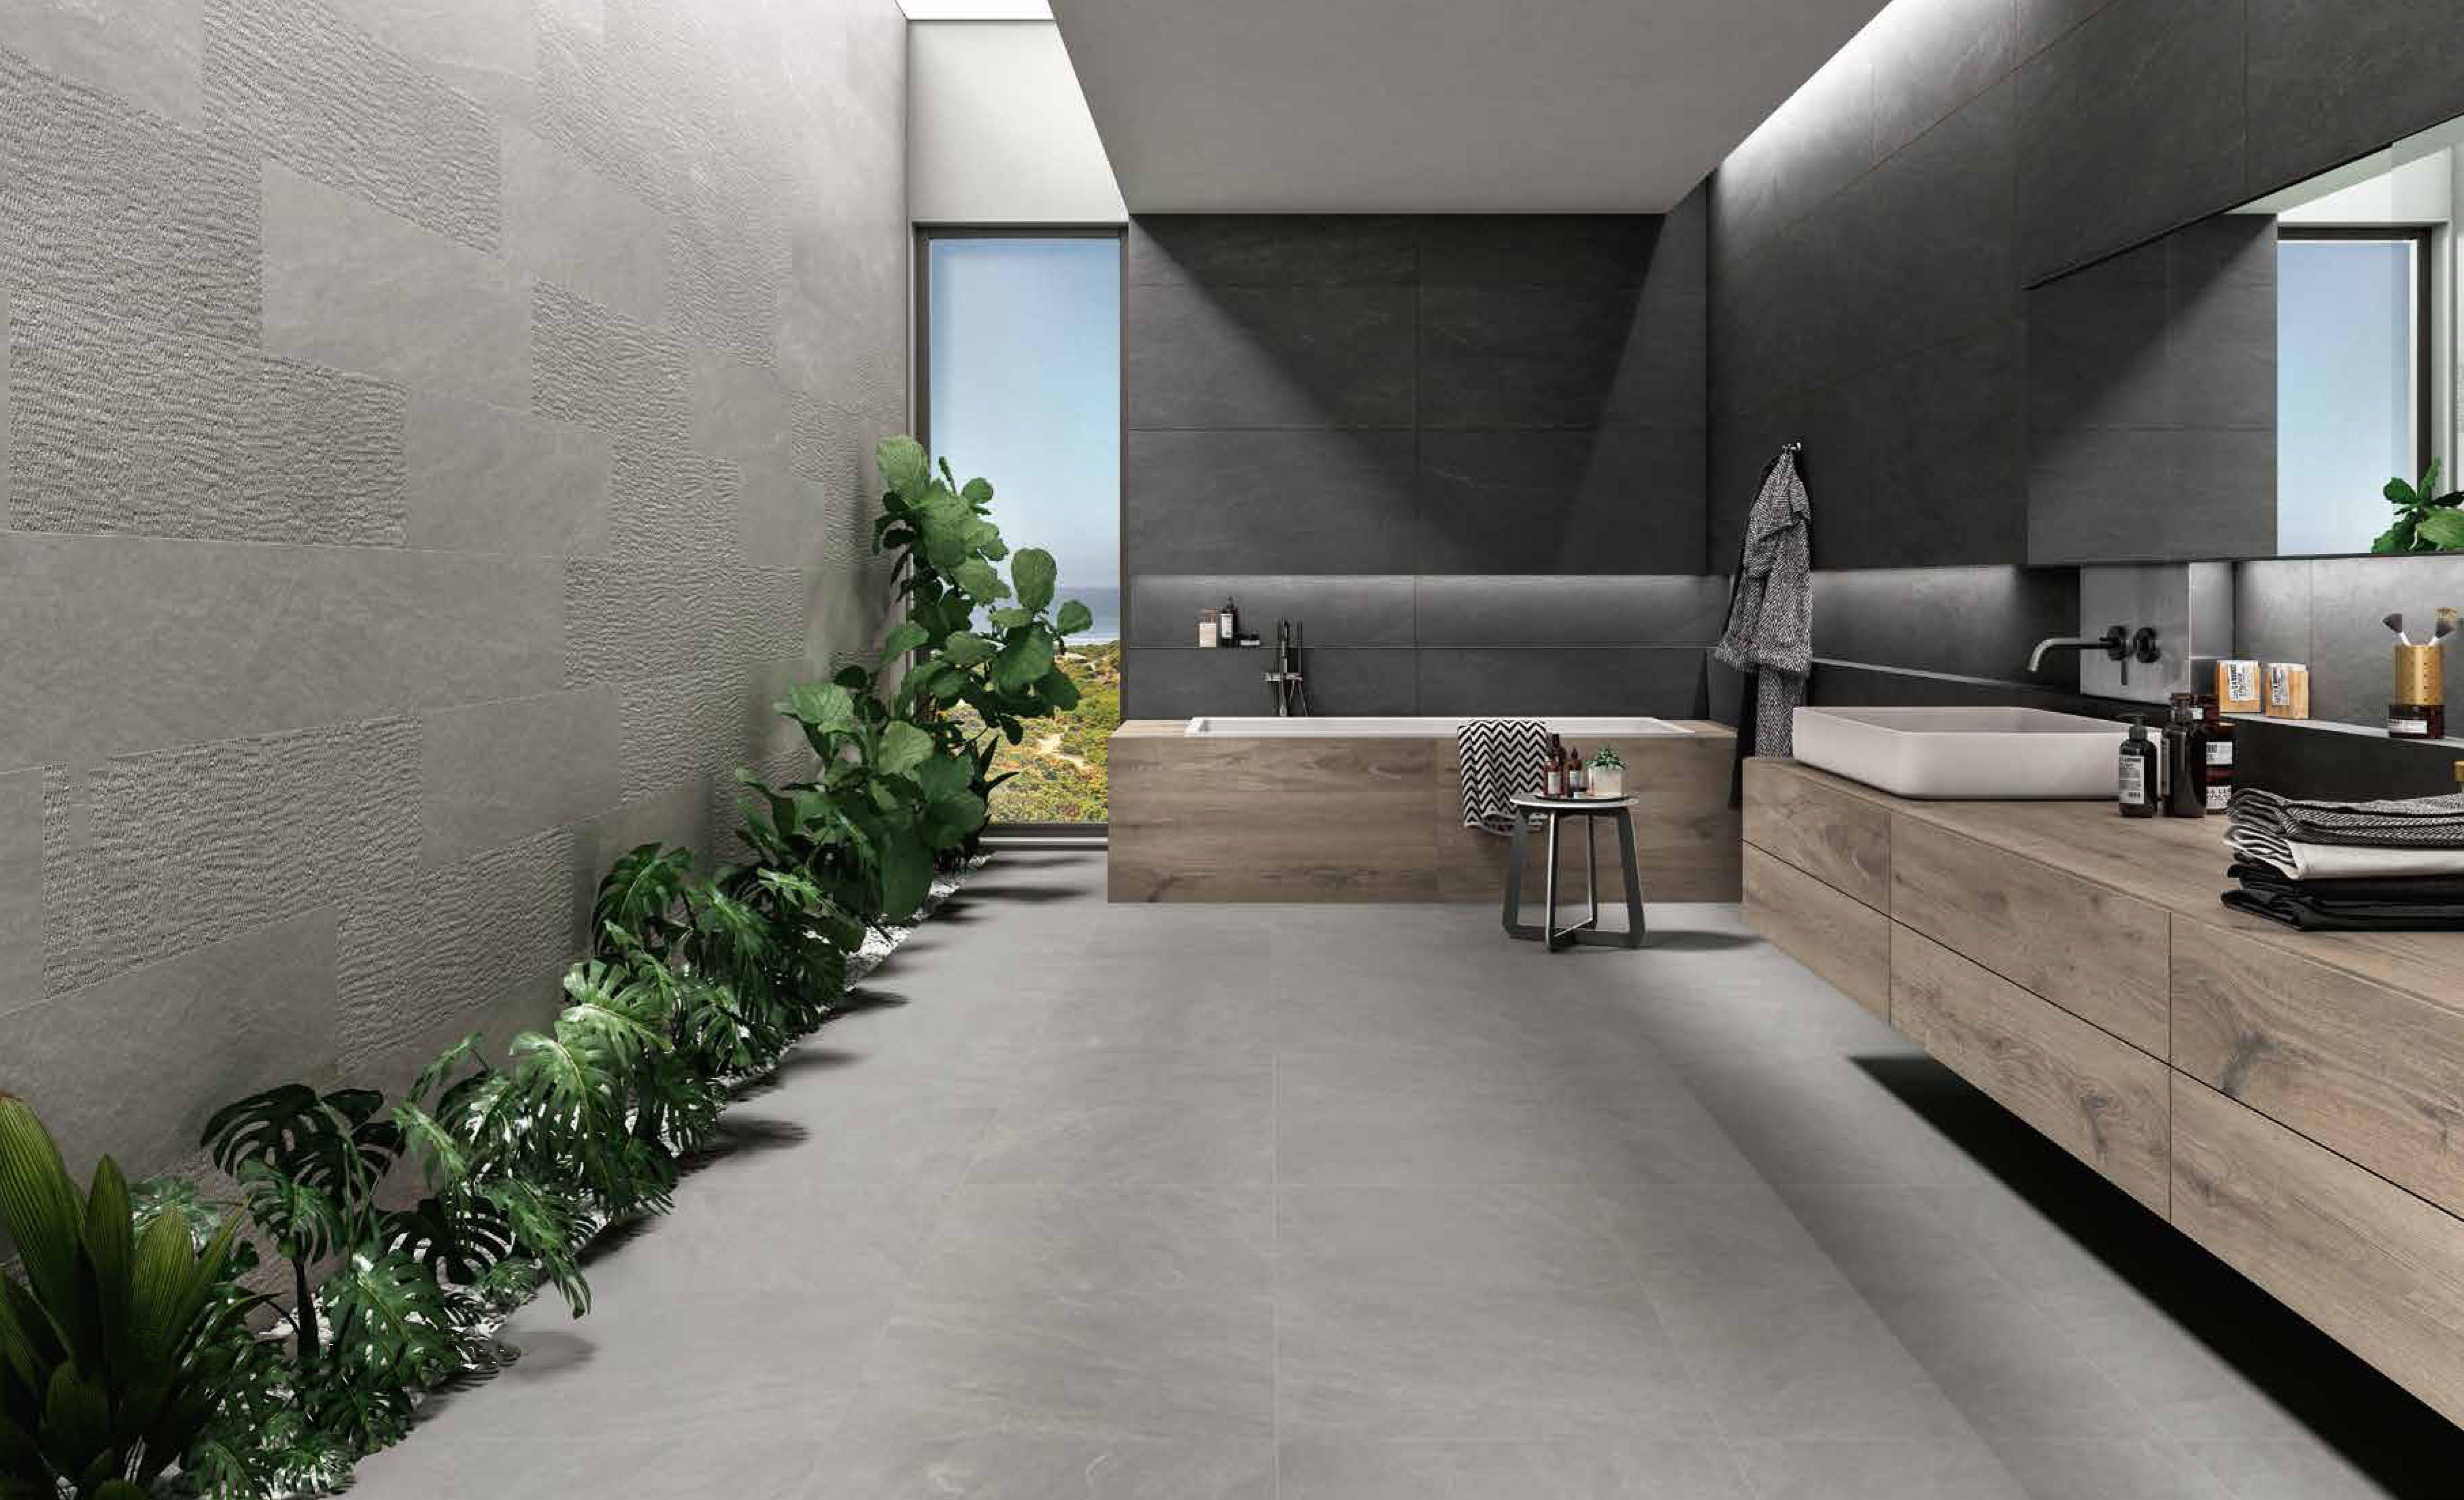 Modern Grey Bathroom With Grey Porcelain Tiles And Wood Vanity And Bathtub Gray Porcelain Tile Porcelain Tile Wood Vanity